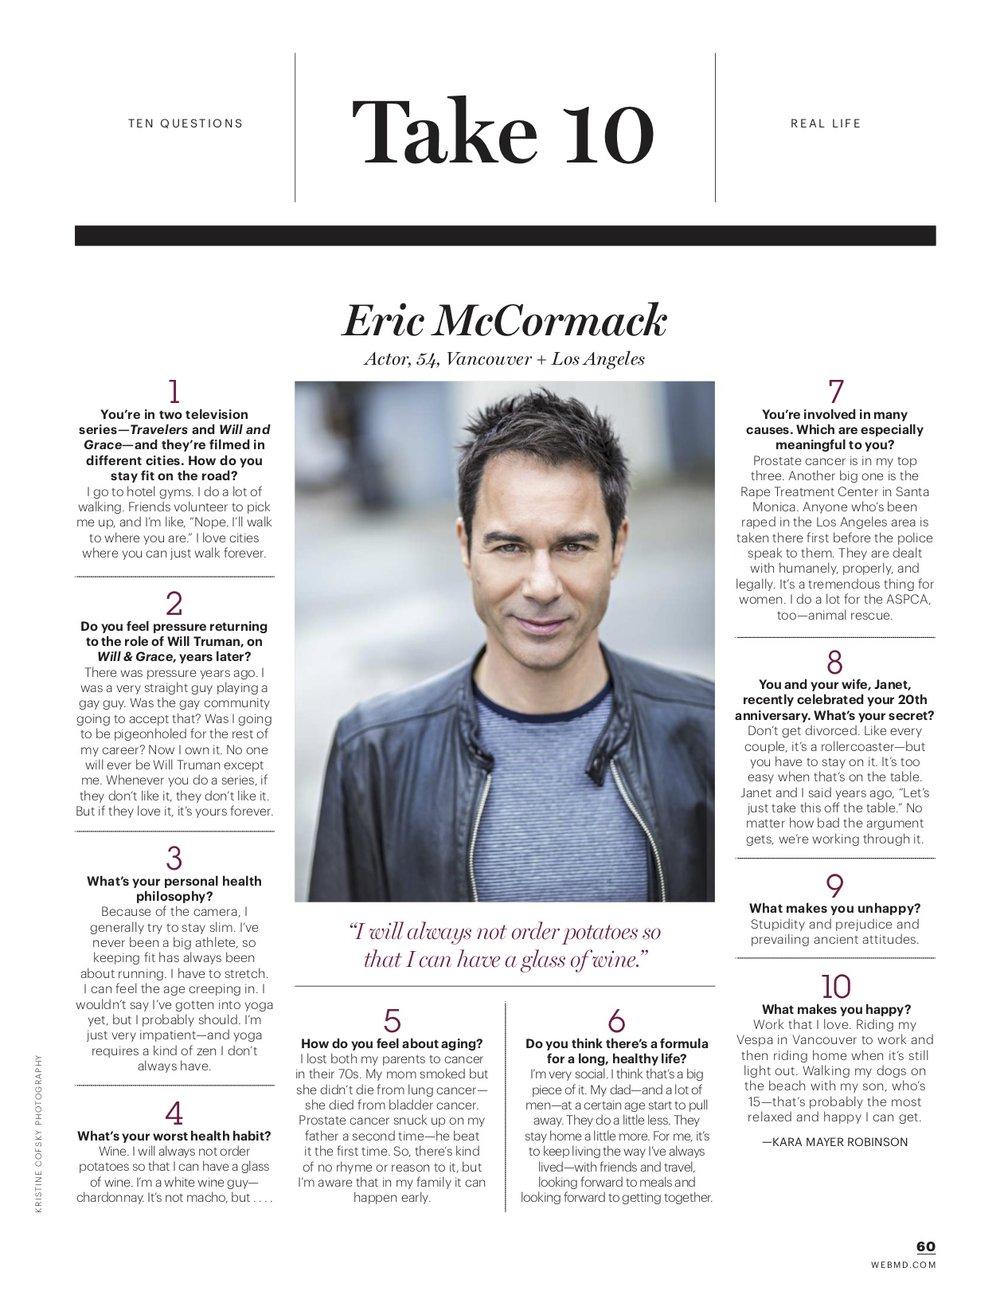 Eric McCormack.jpg